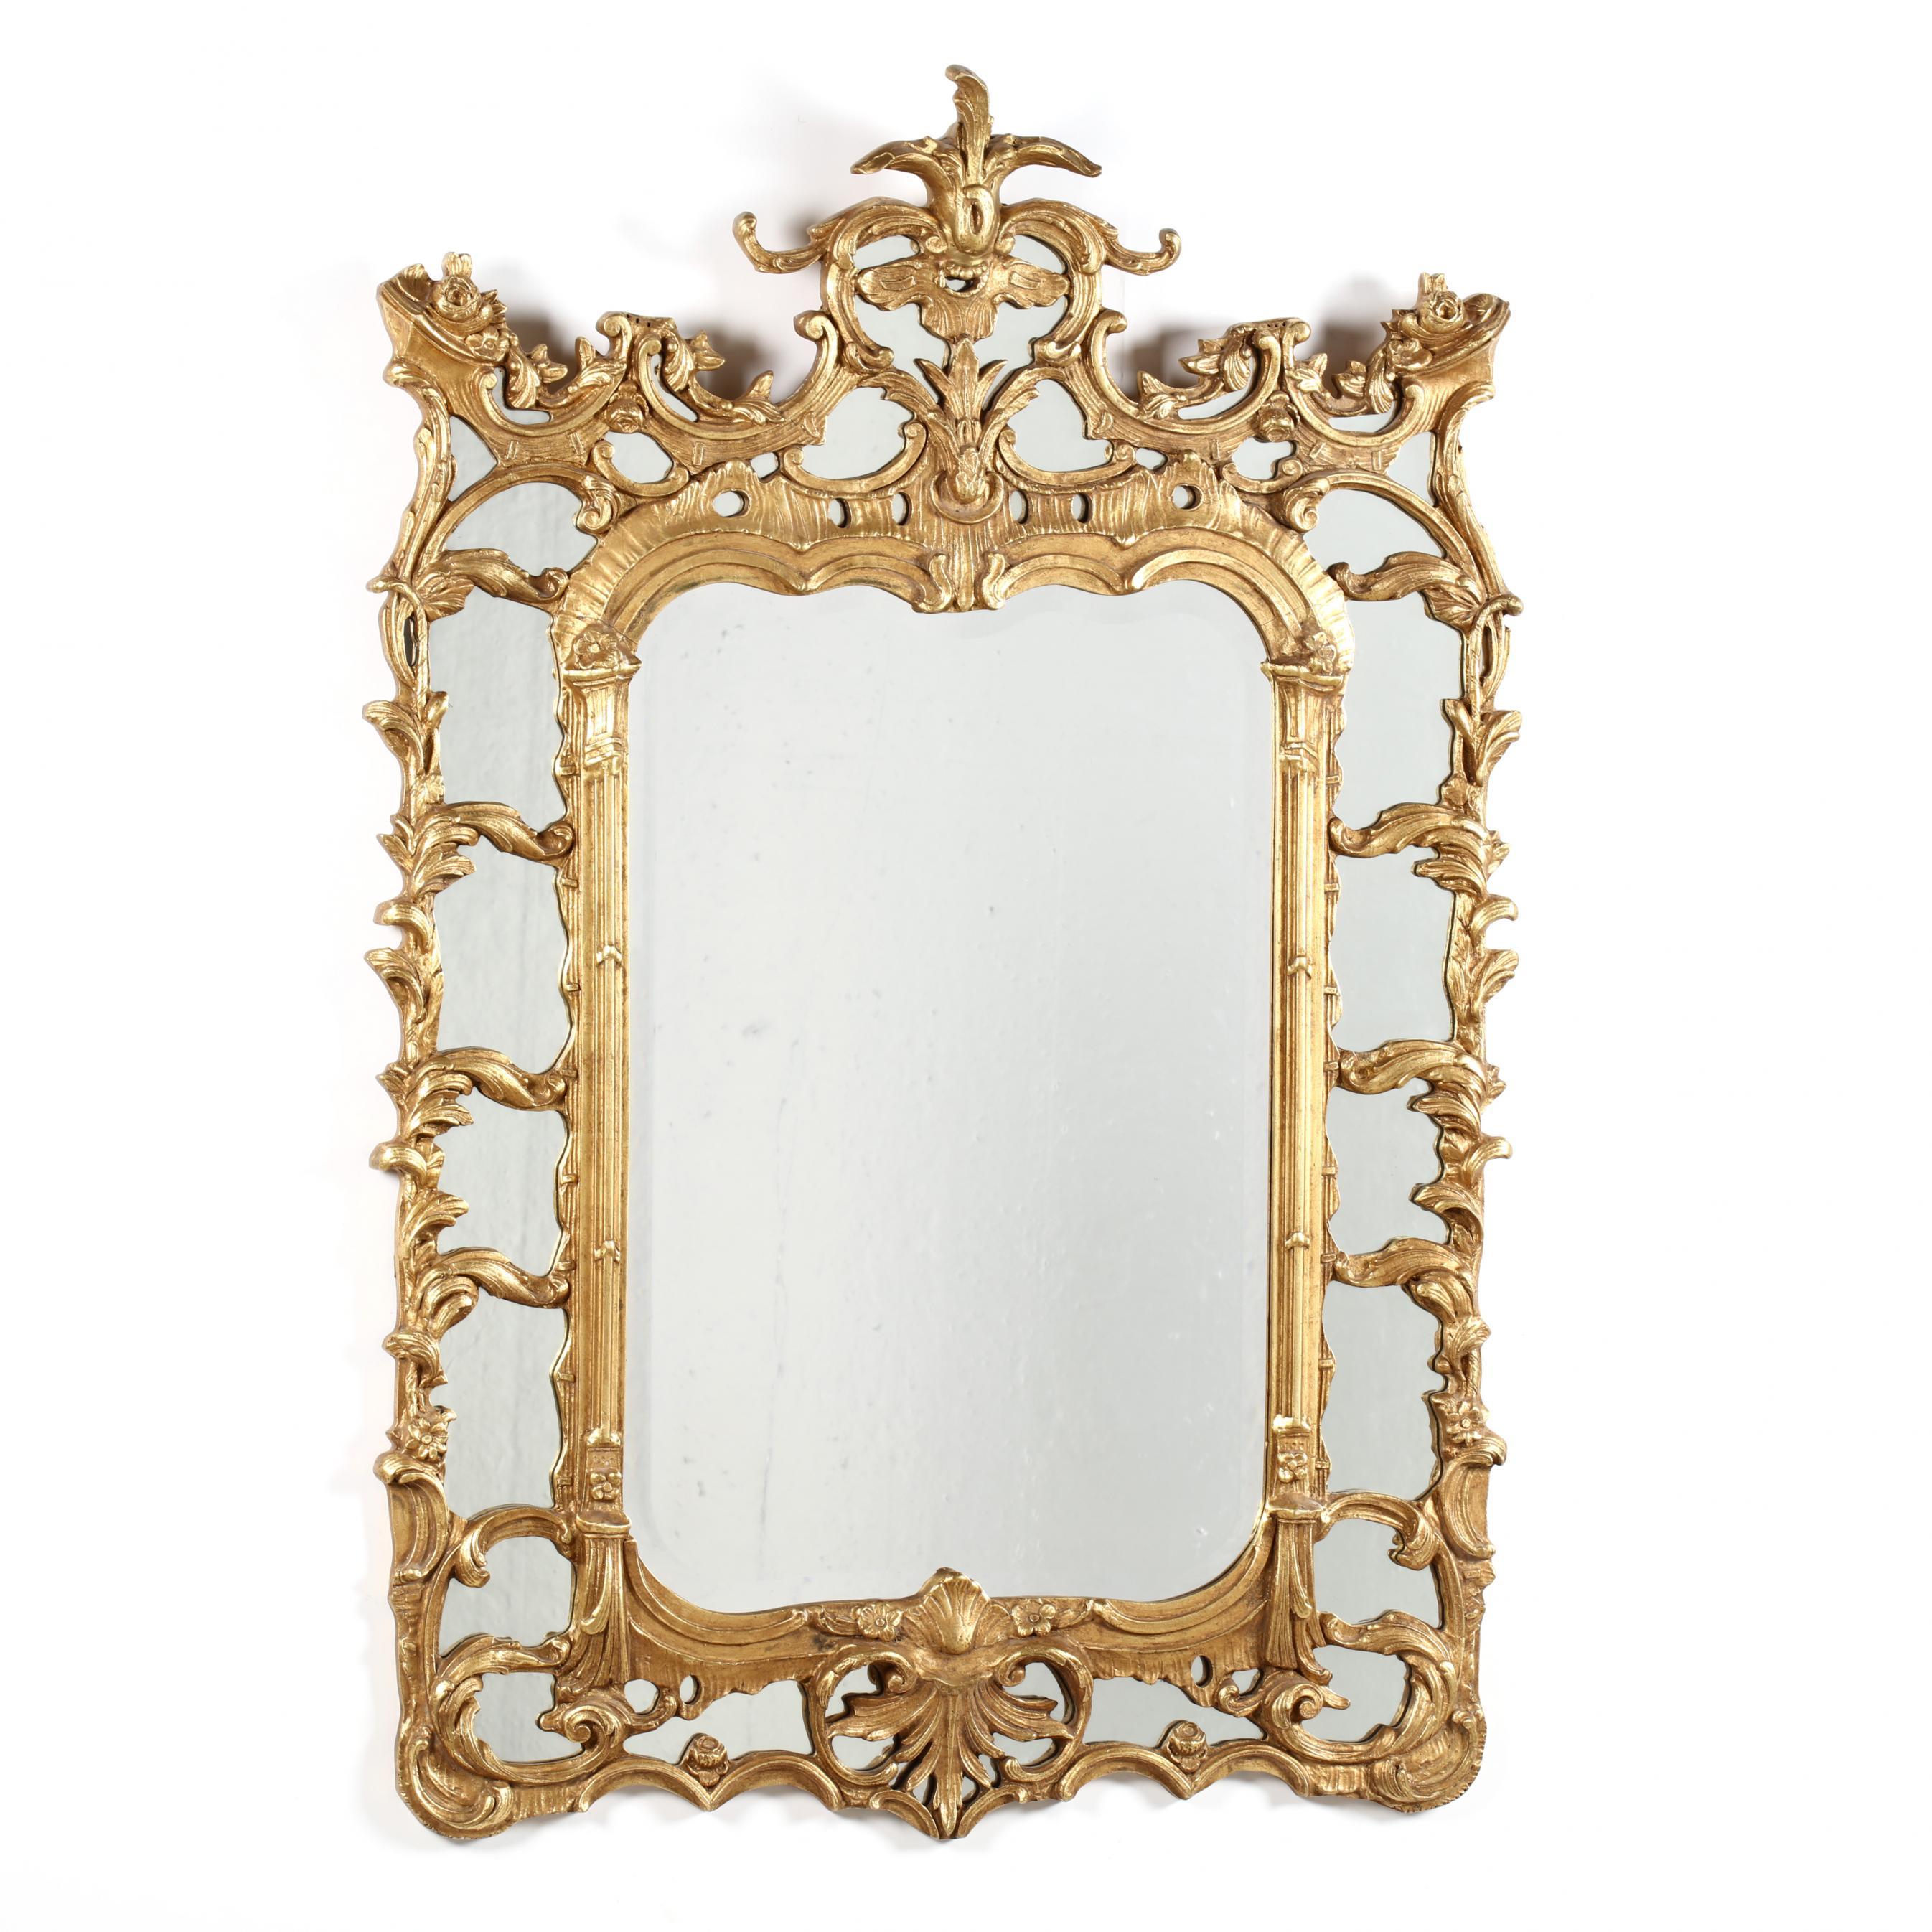 friedman-bros-italian-rococo-style-gilt-mirror